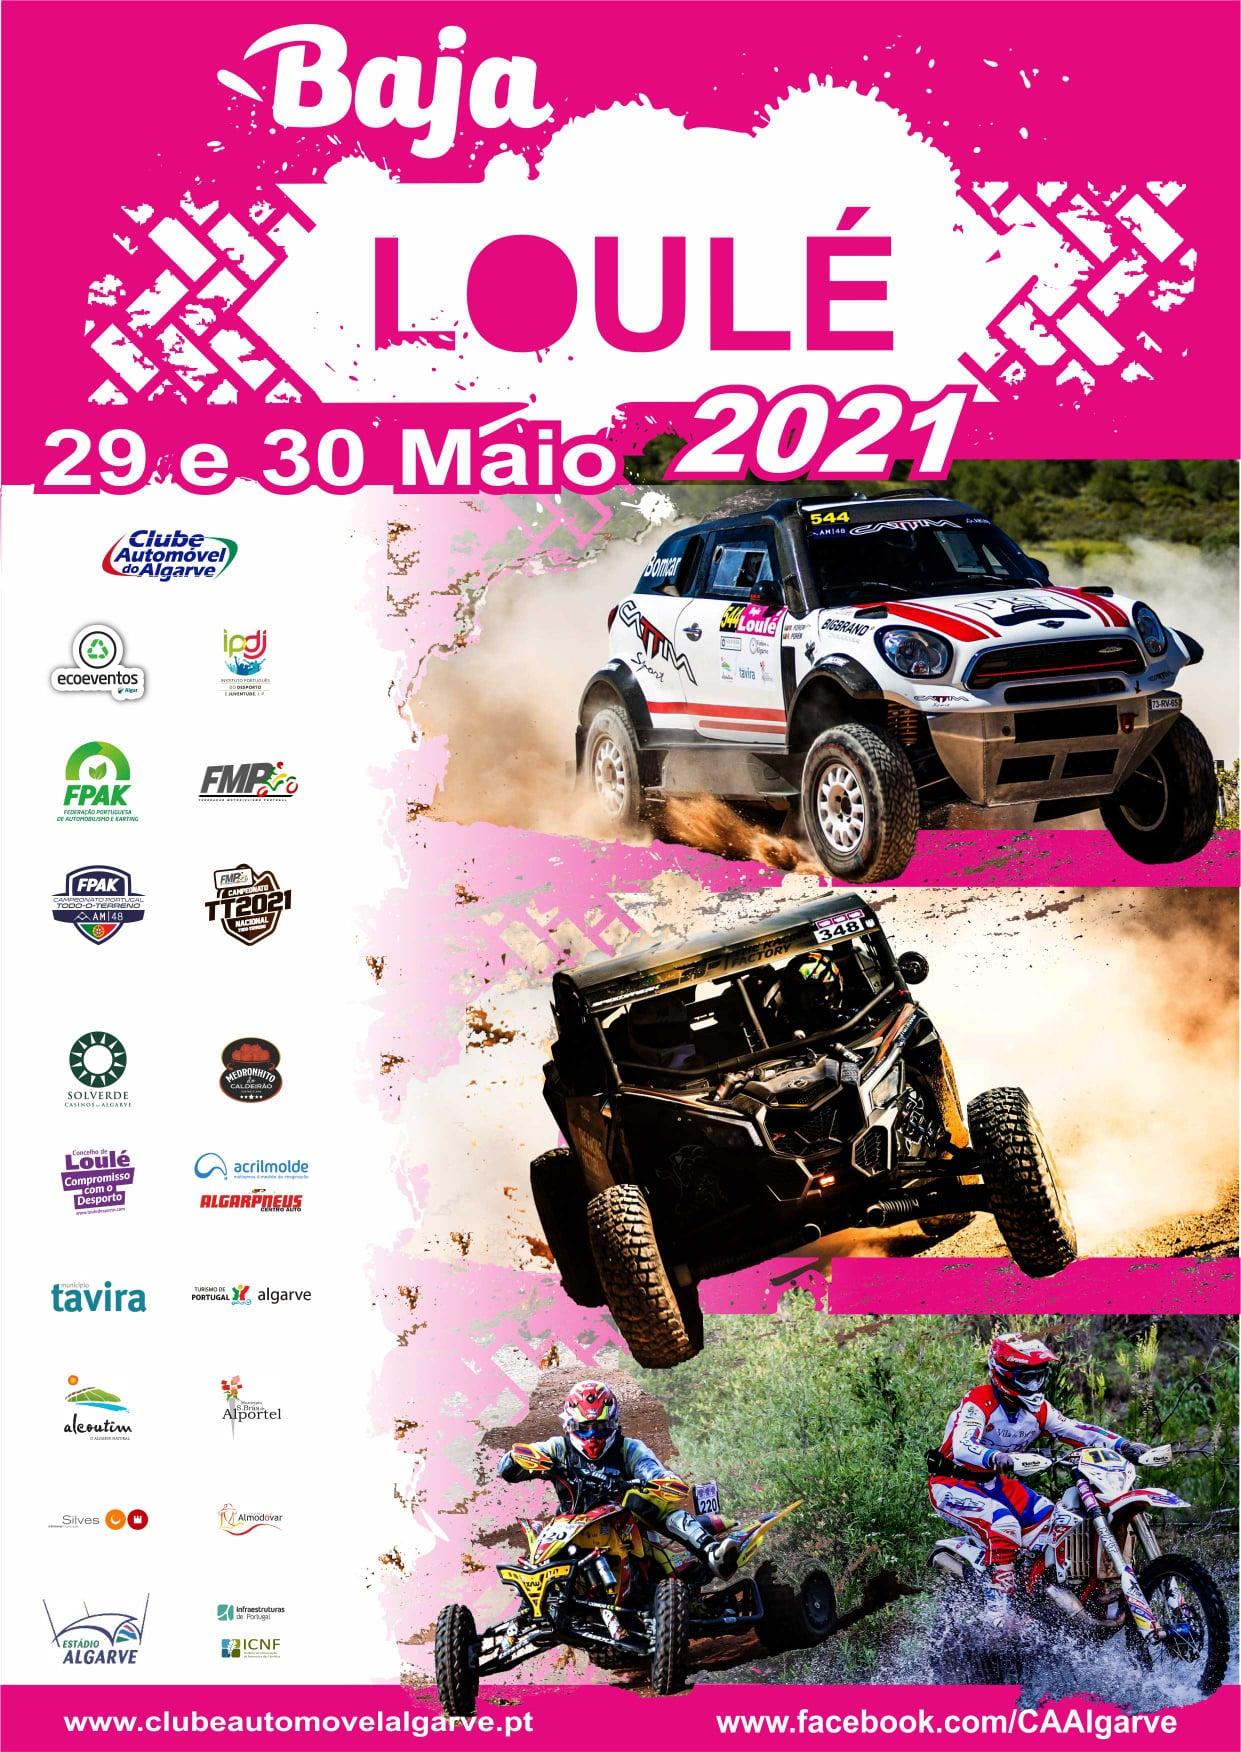 Baja Loule TT 2021